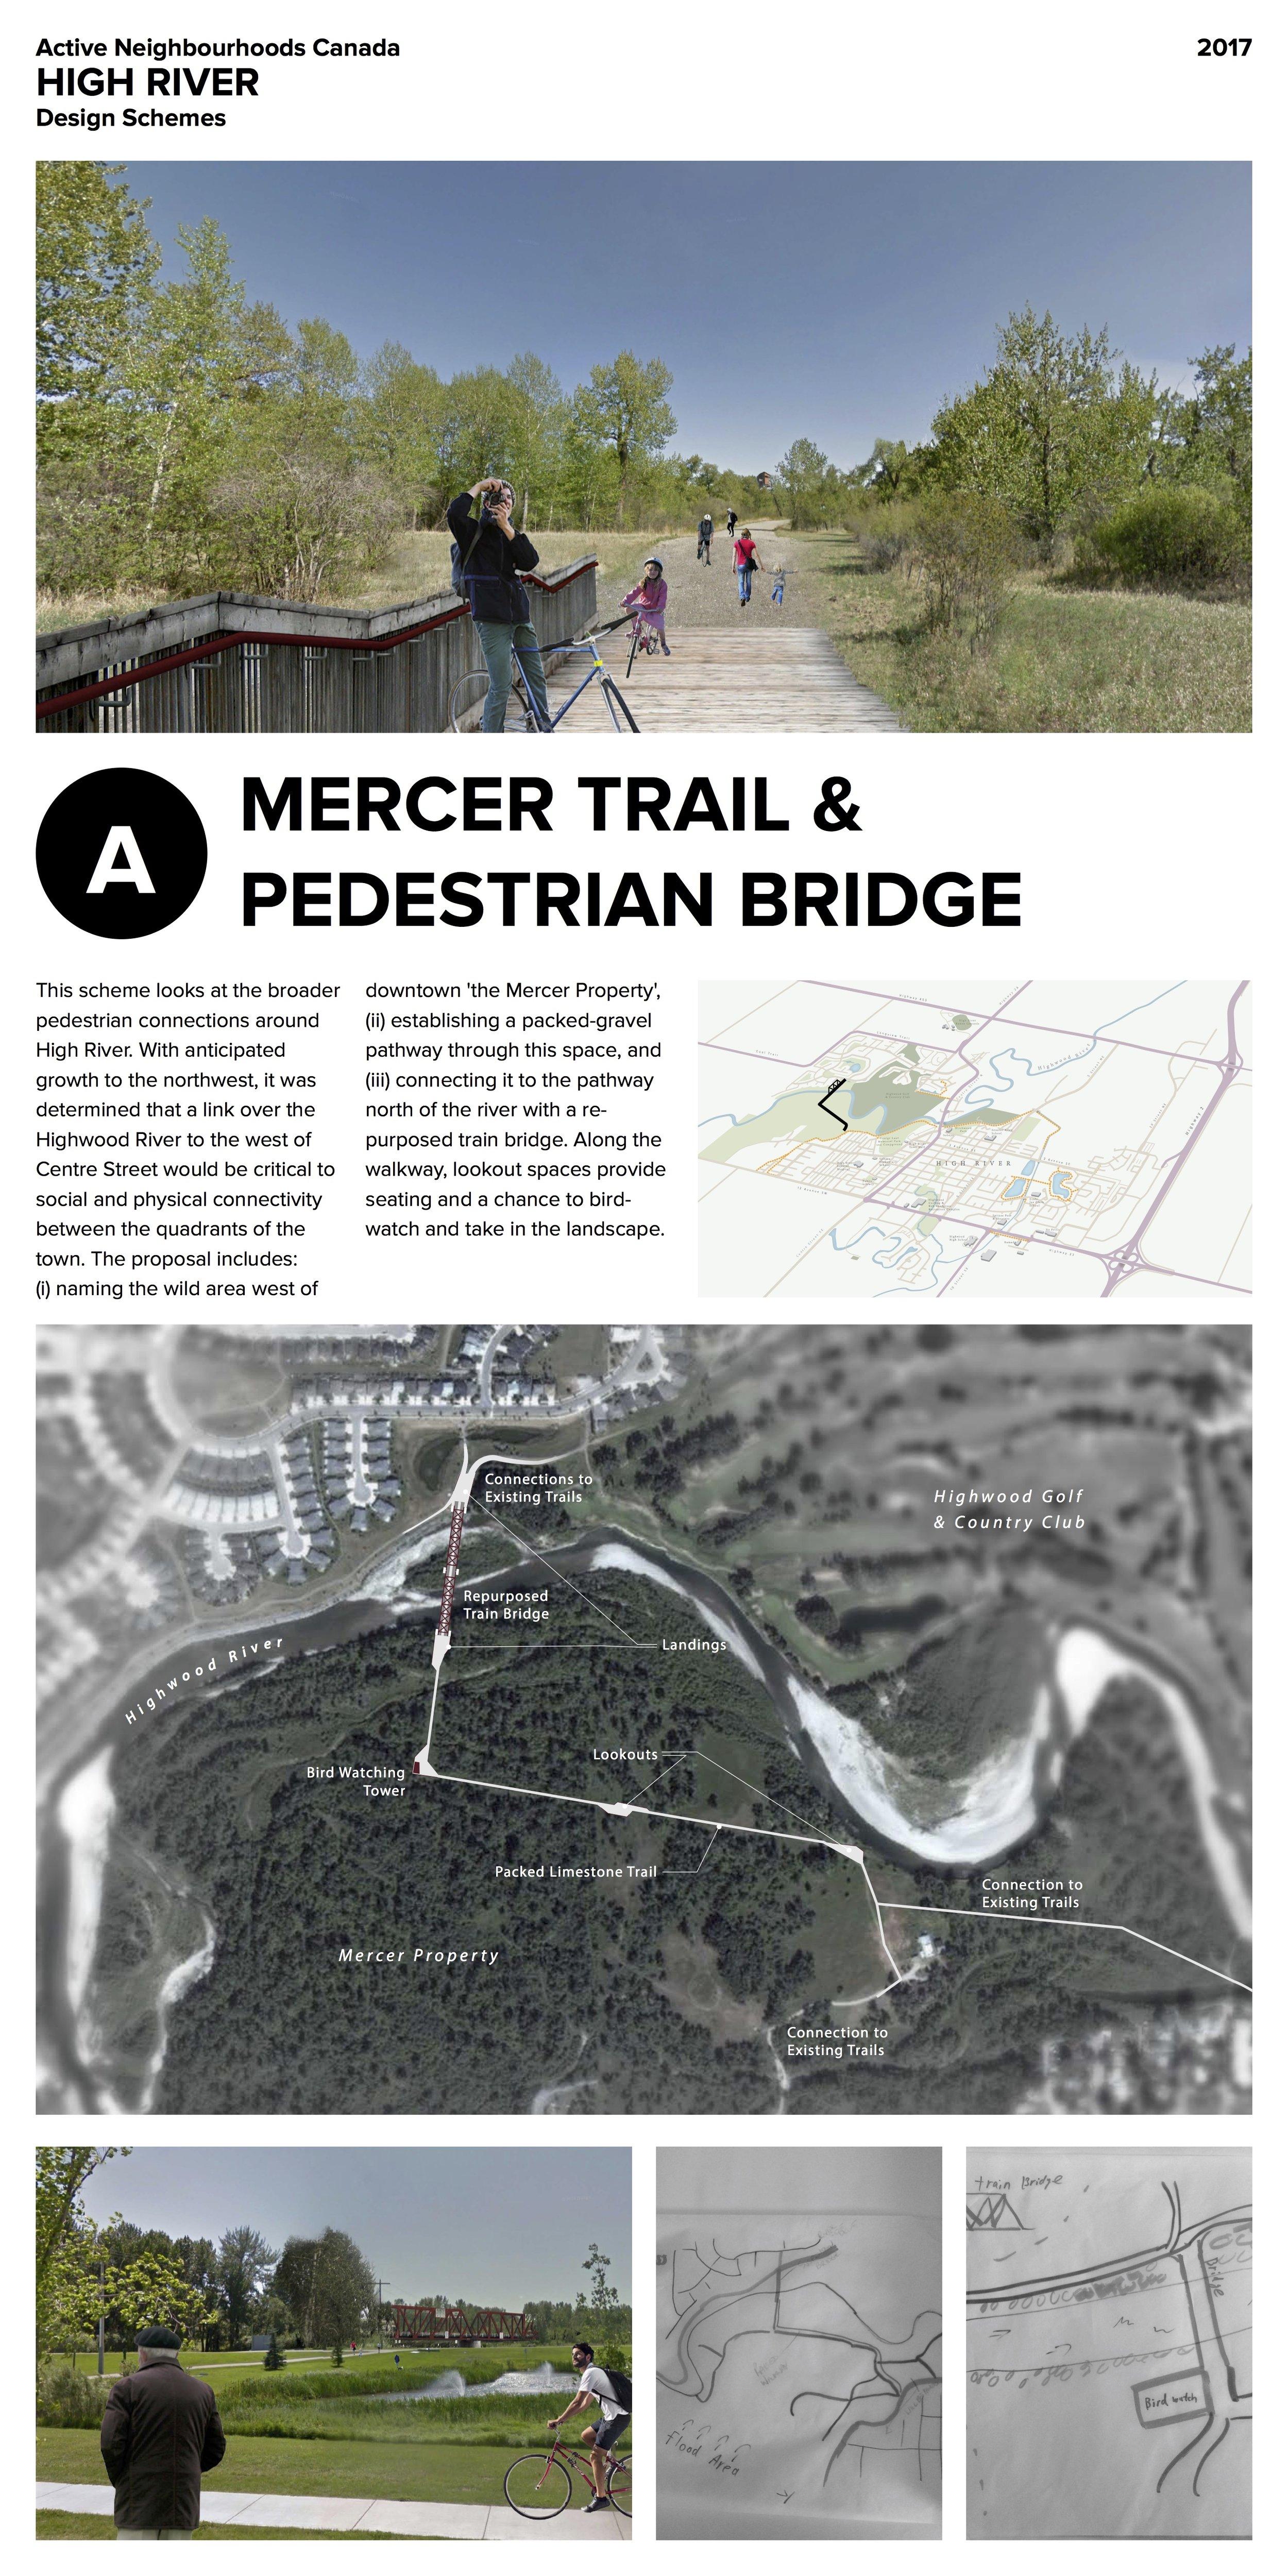 High River Schemes page 2.jpg